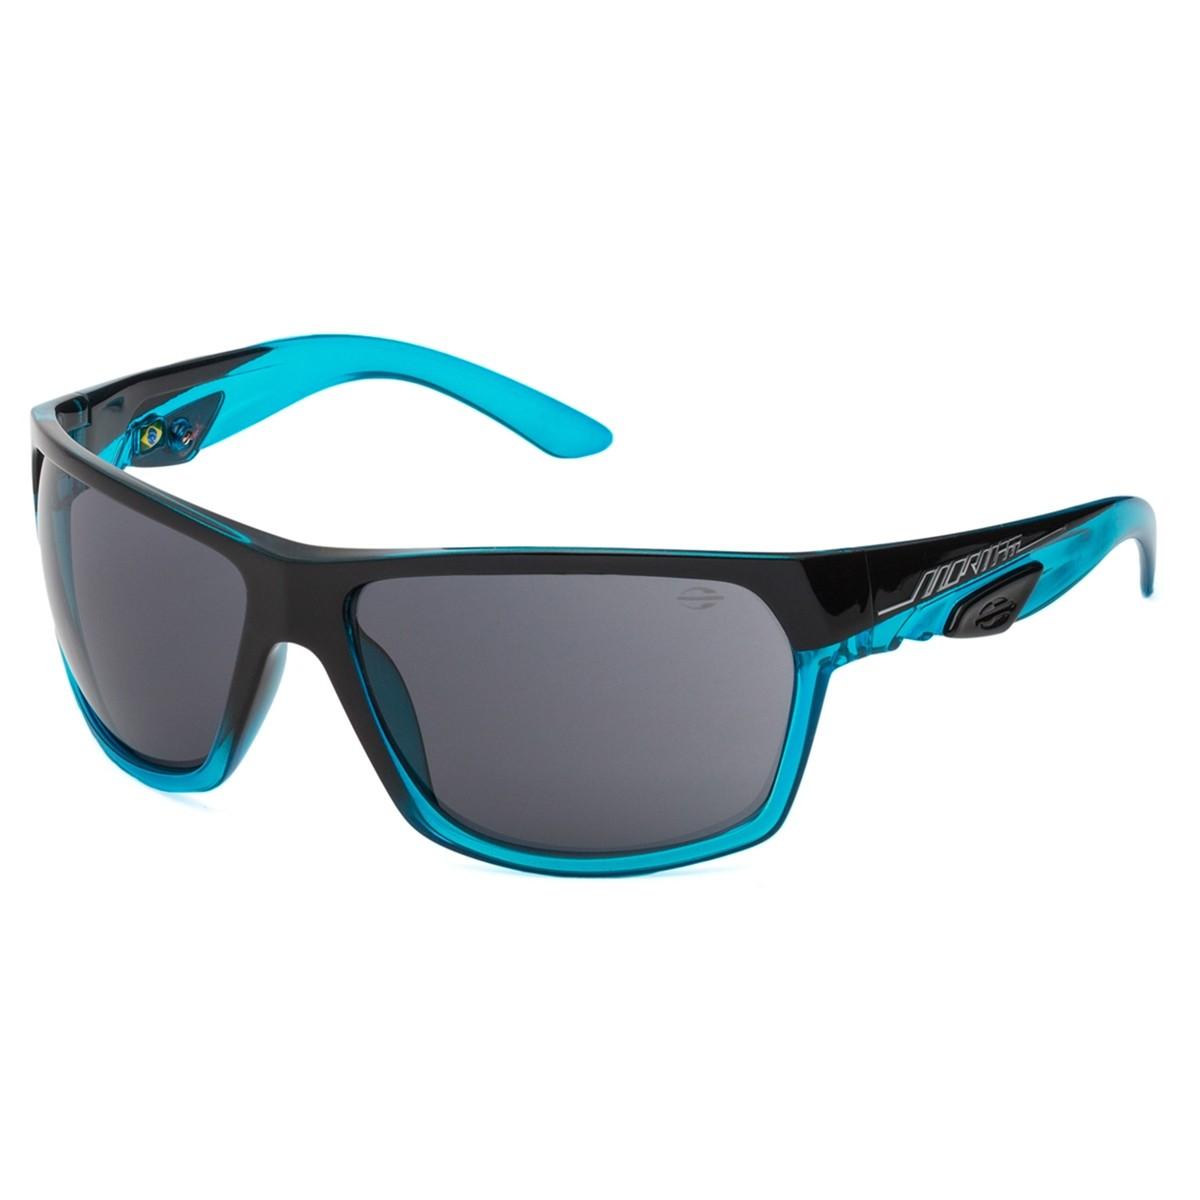 2c7725803 Compre Óculos de Sol Mormaii Amazonia II em 10X | Tri-Jóia Shop